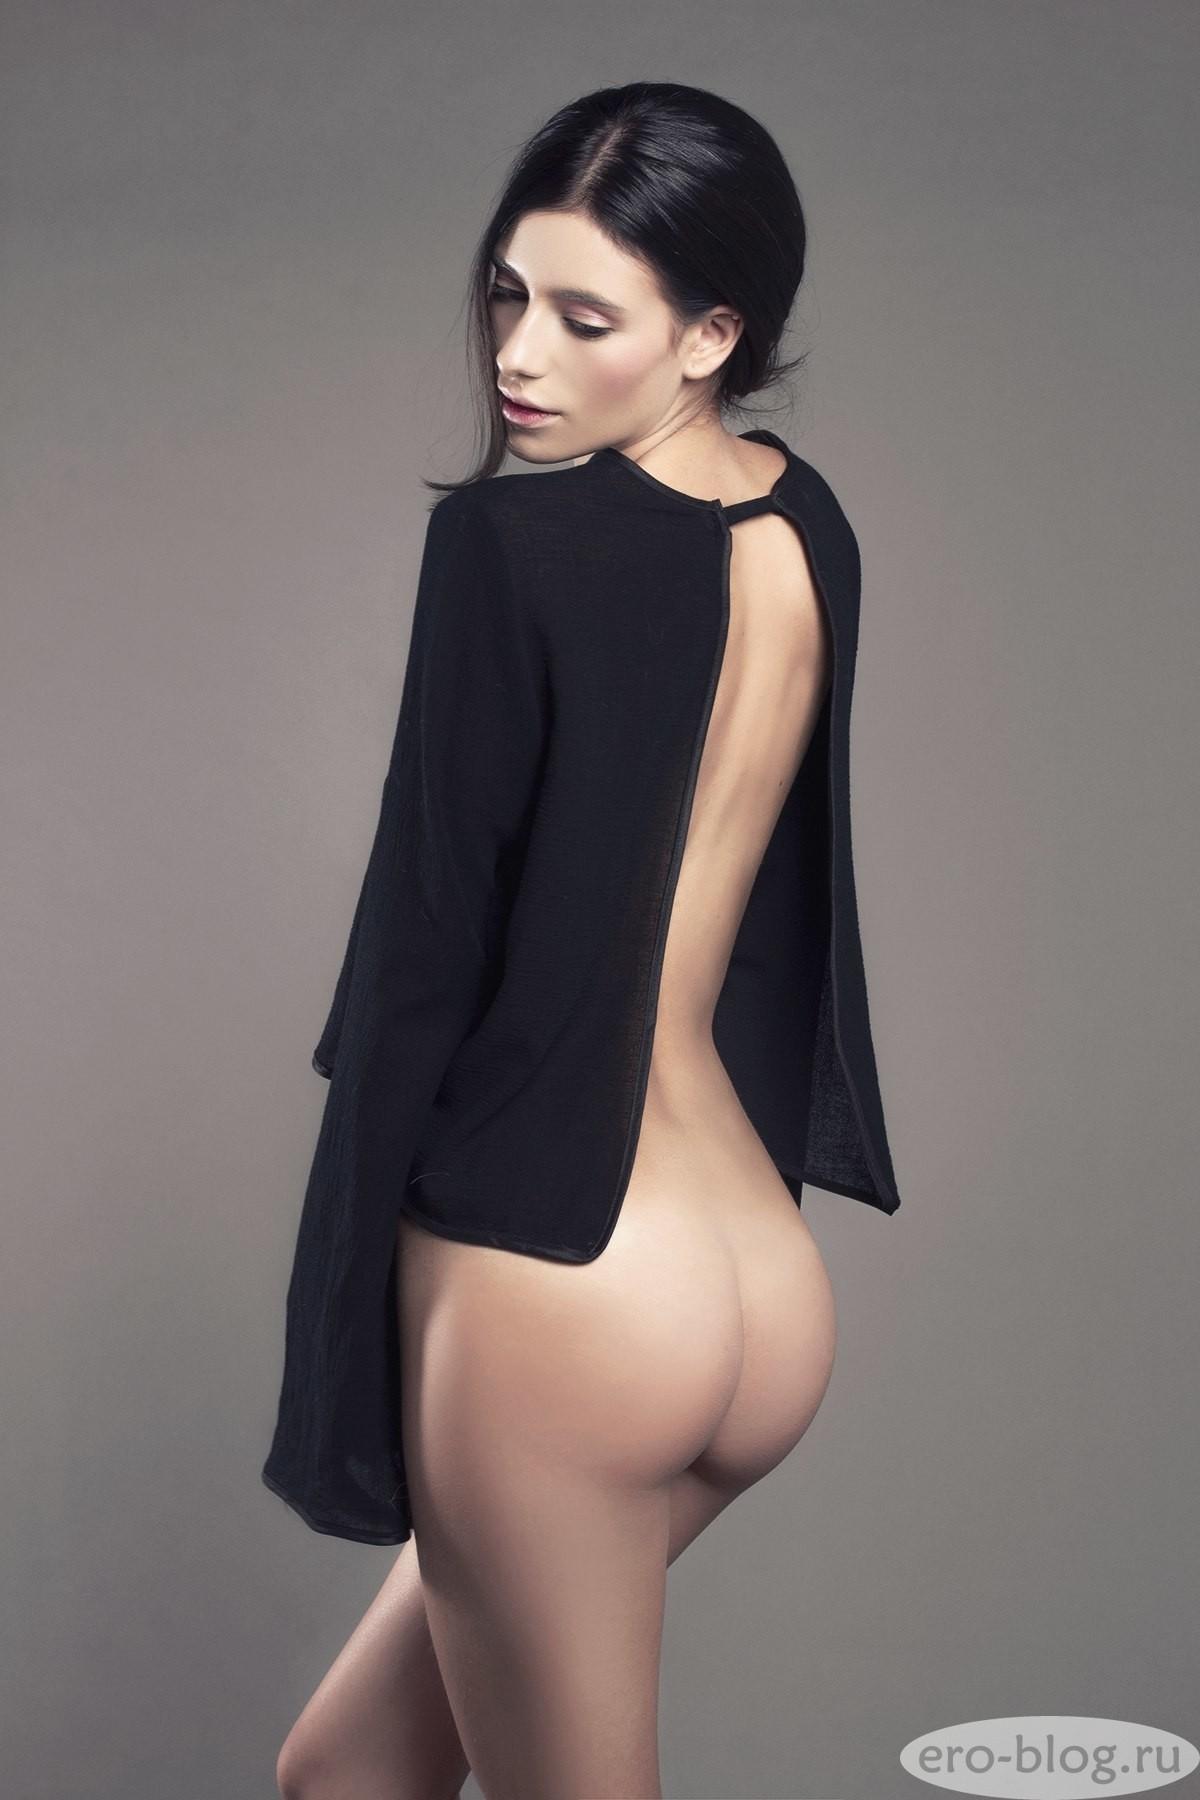 Голая обнаженная Алехандра Гильман интимные фото звезды